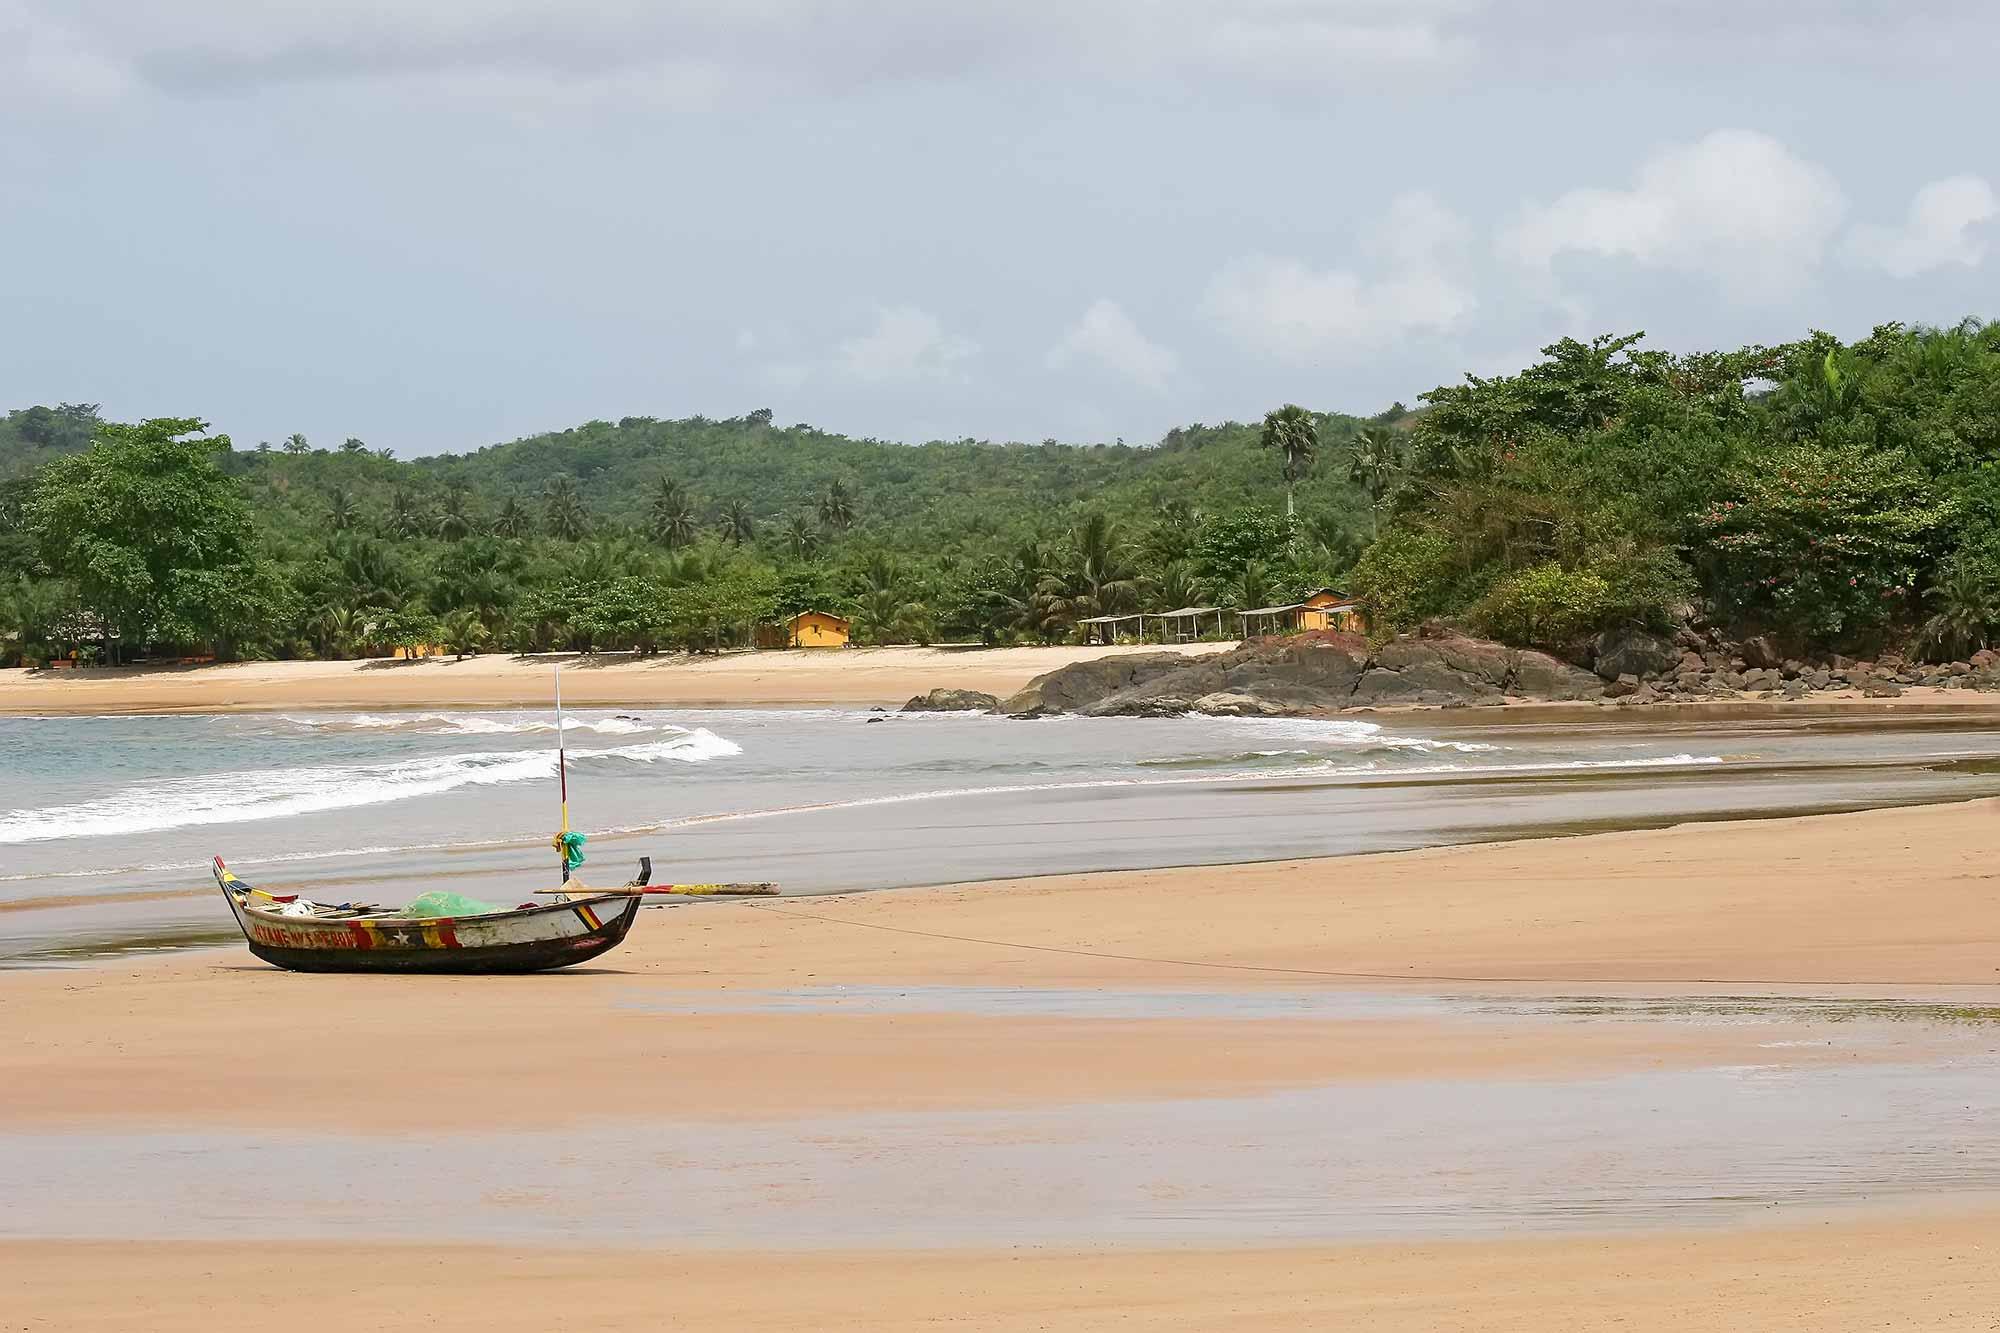 takoradi-beach-in-ghana-africa